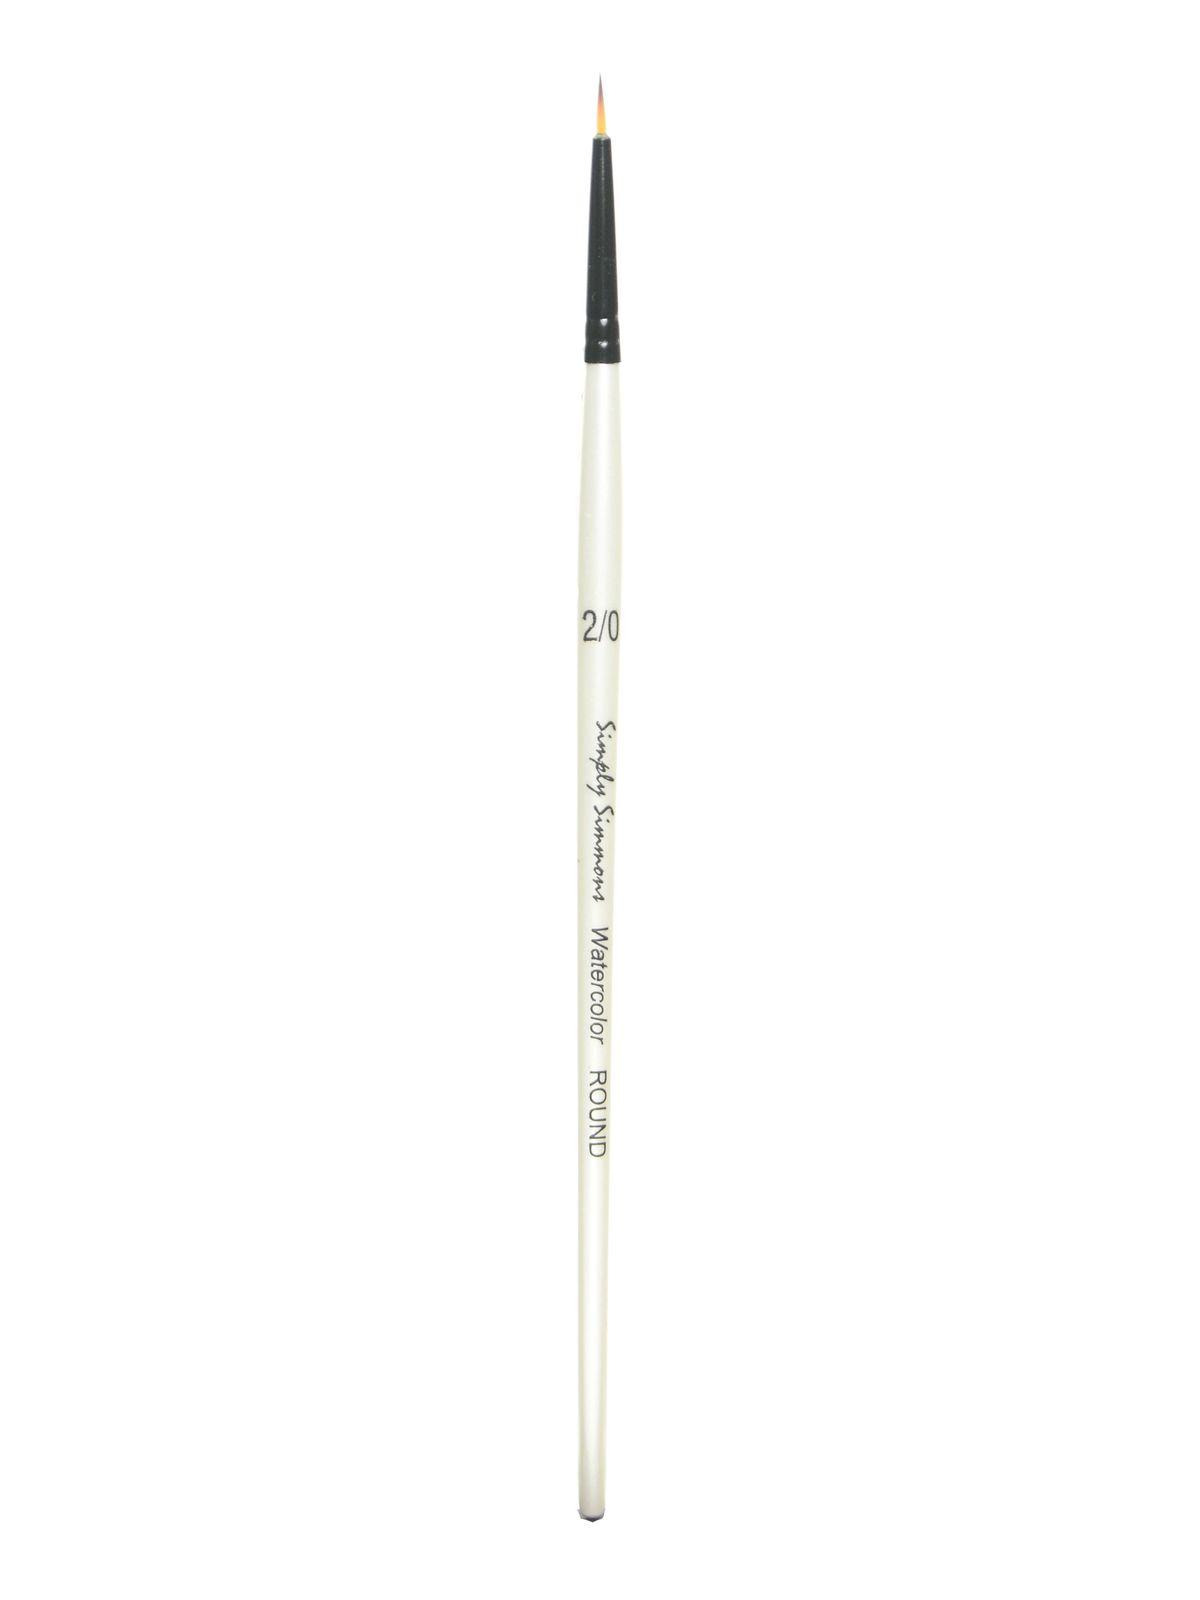 White Case of 12 1 Diameter x 48 Length For Broom and Floor Scrub Brush Regal 90502 Fiberglass Handle